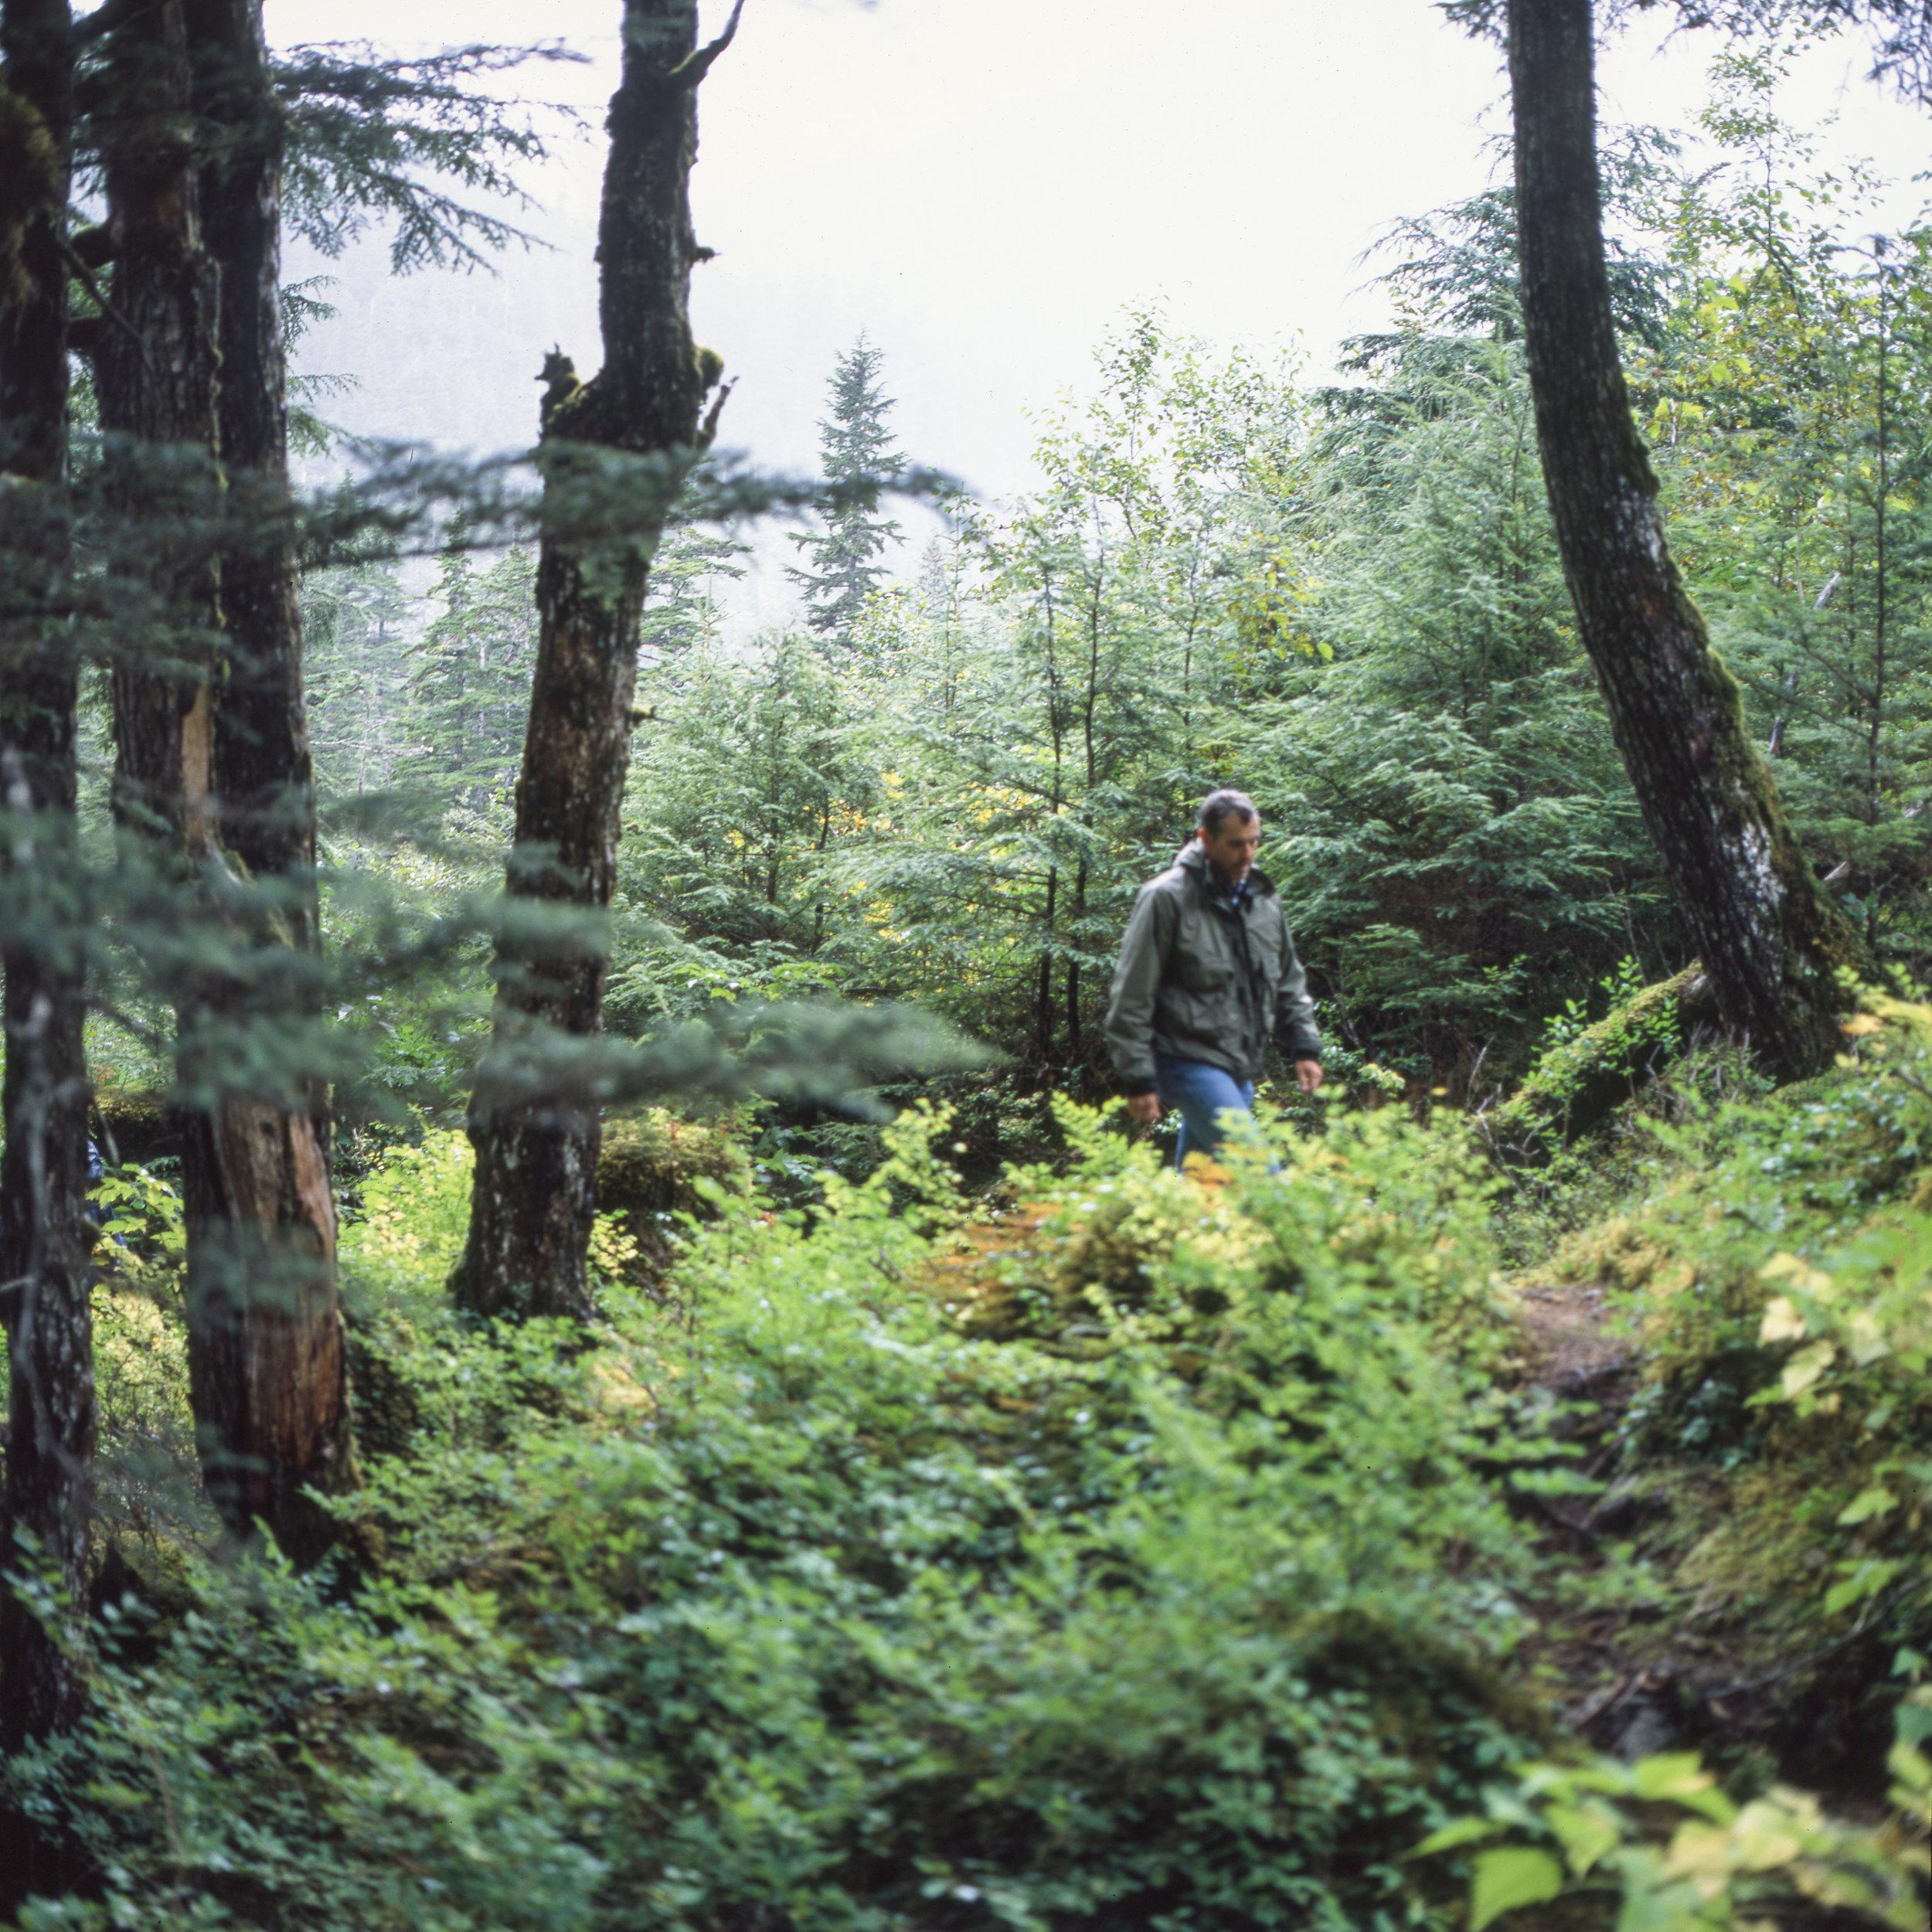 Dad on the hike Hasselblad 501cm   Fuji Provia 100f